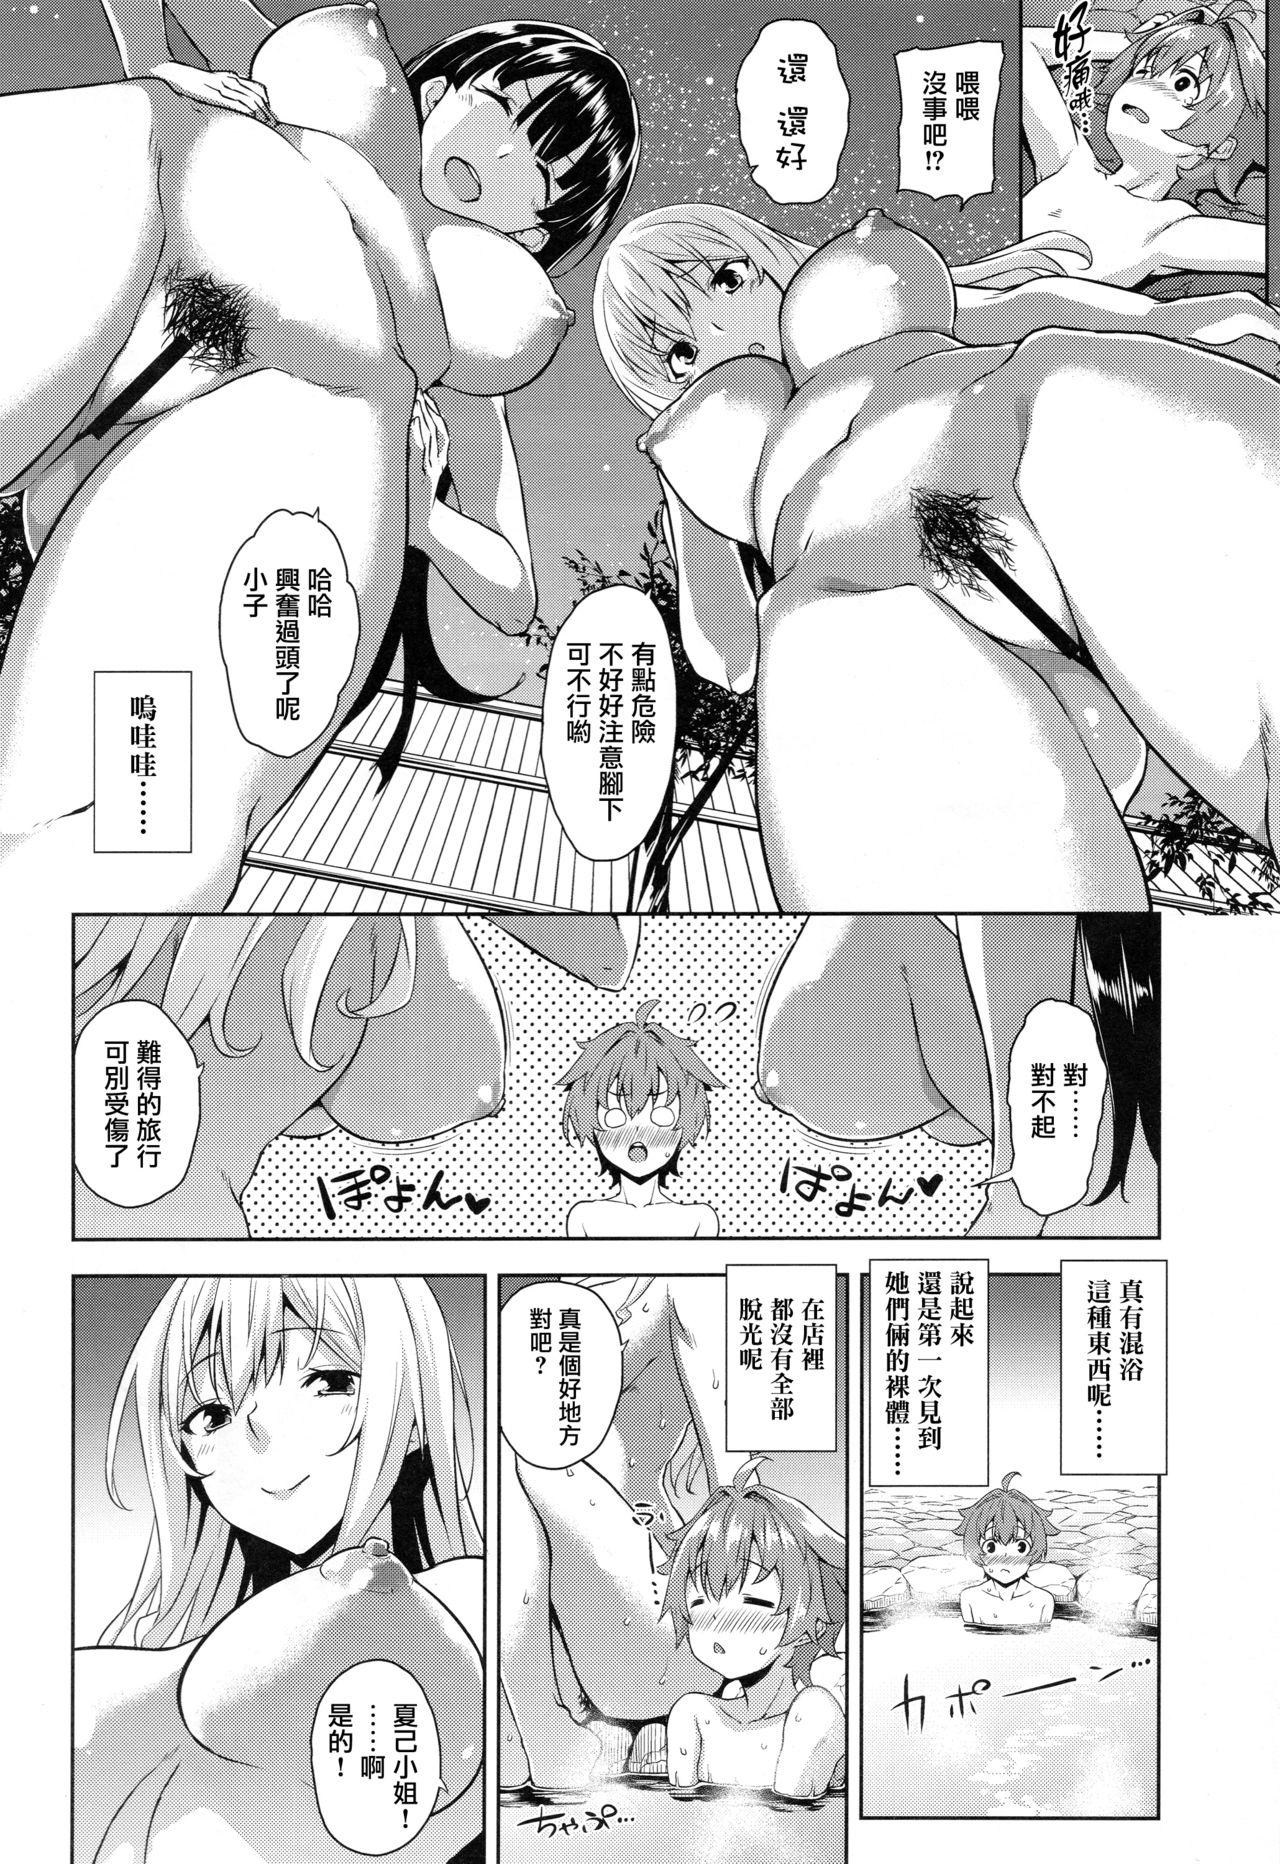 (C92) [Σ-Arts (Mikemono Yuu)] Mayoiga no Onee-san OVA-ka Kinengou Monochro Hen [Chinese] [无毒汉化组] 3